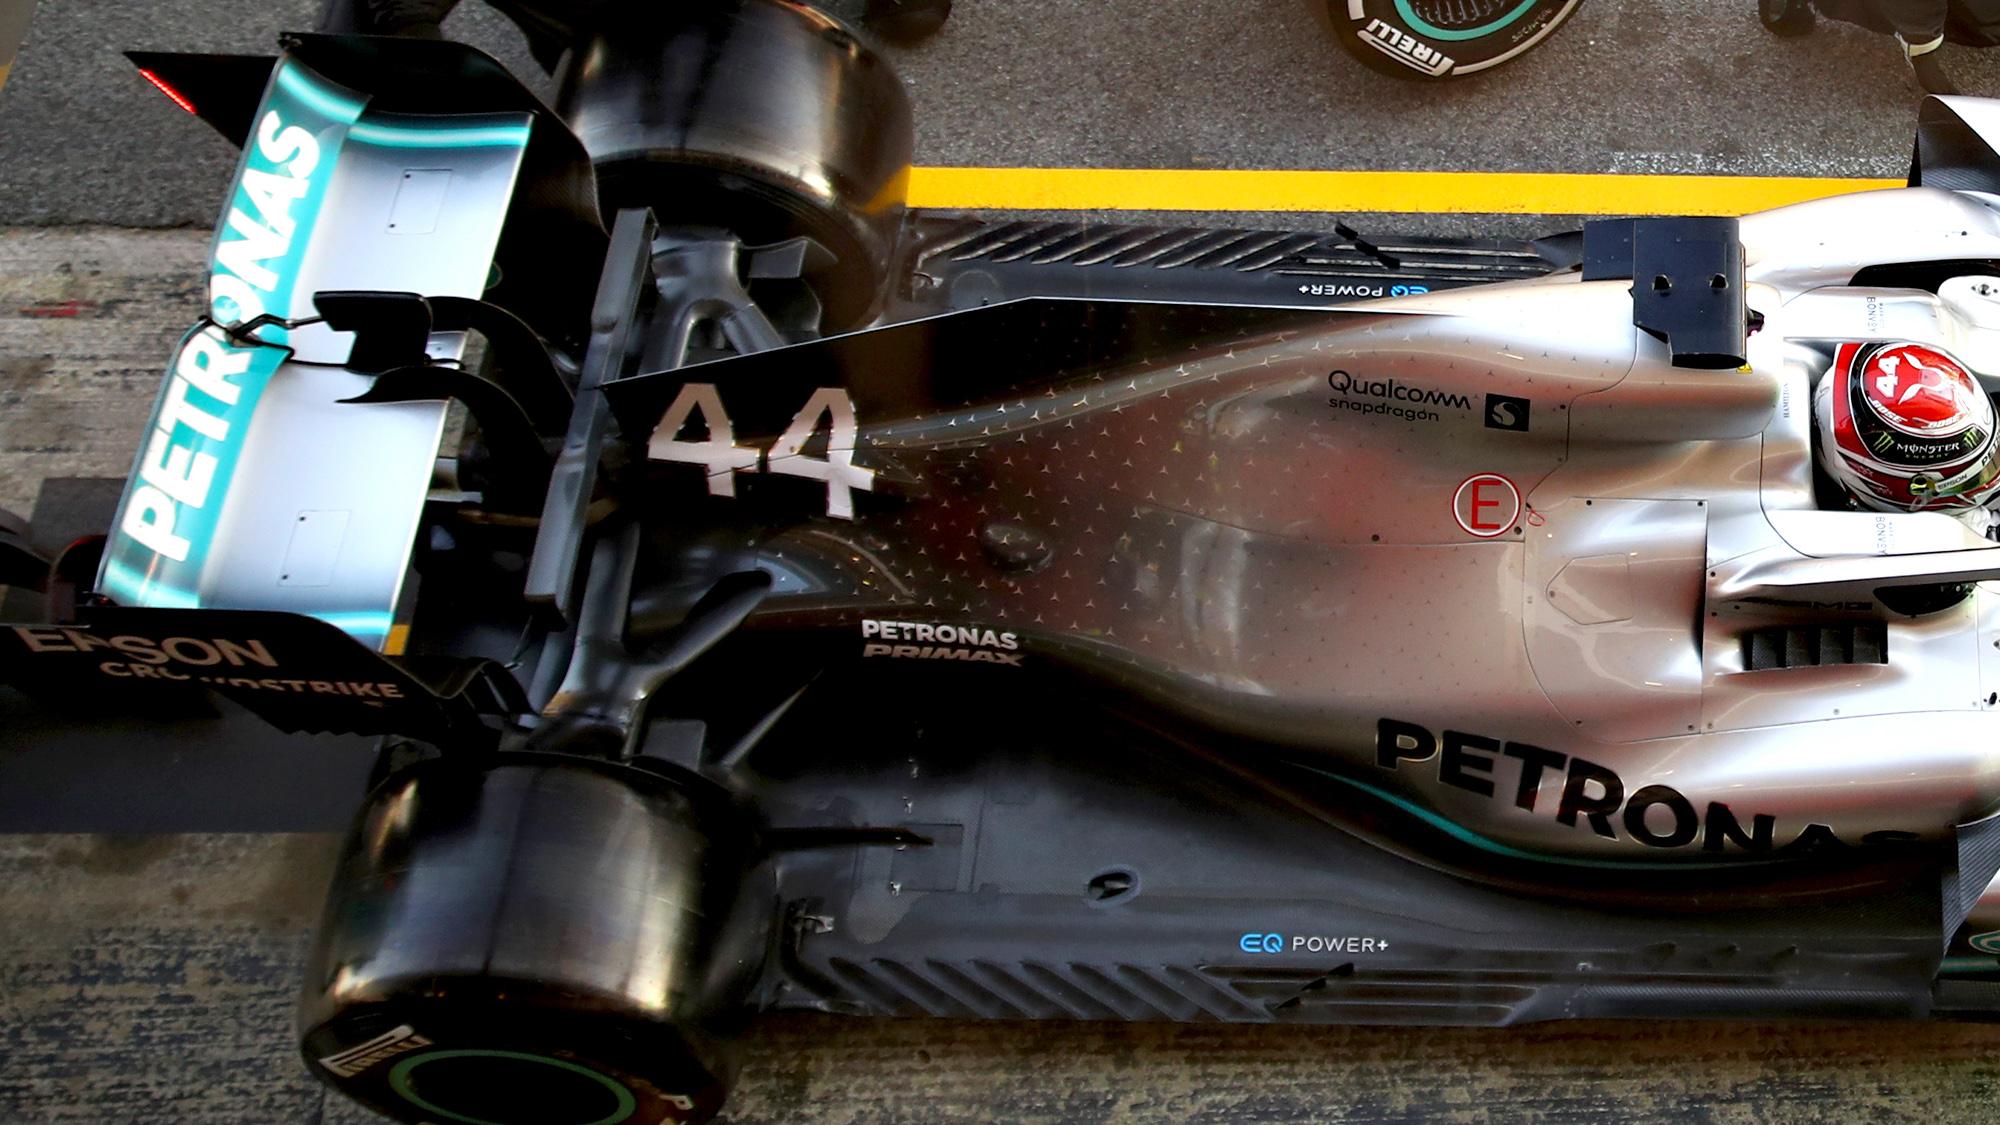 Mercedes 2019 pitstop rear